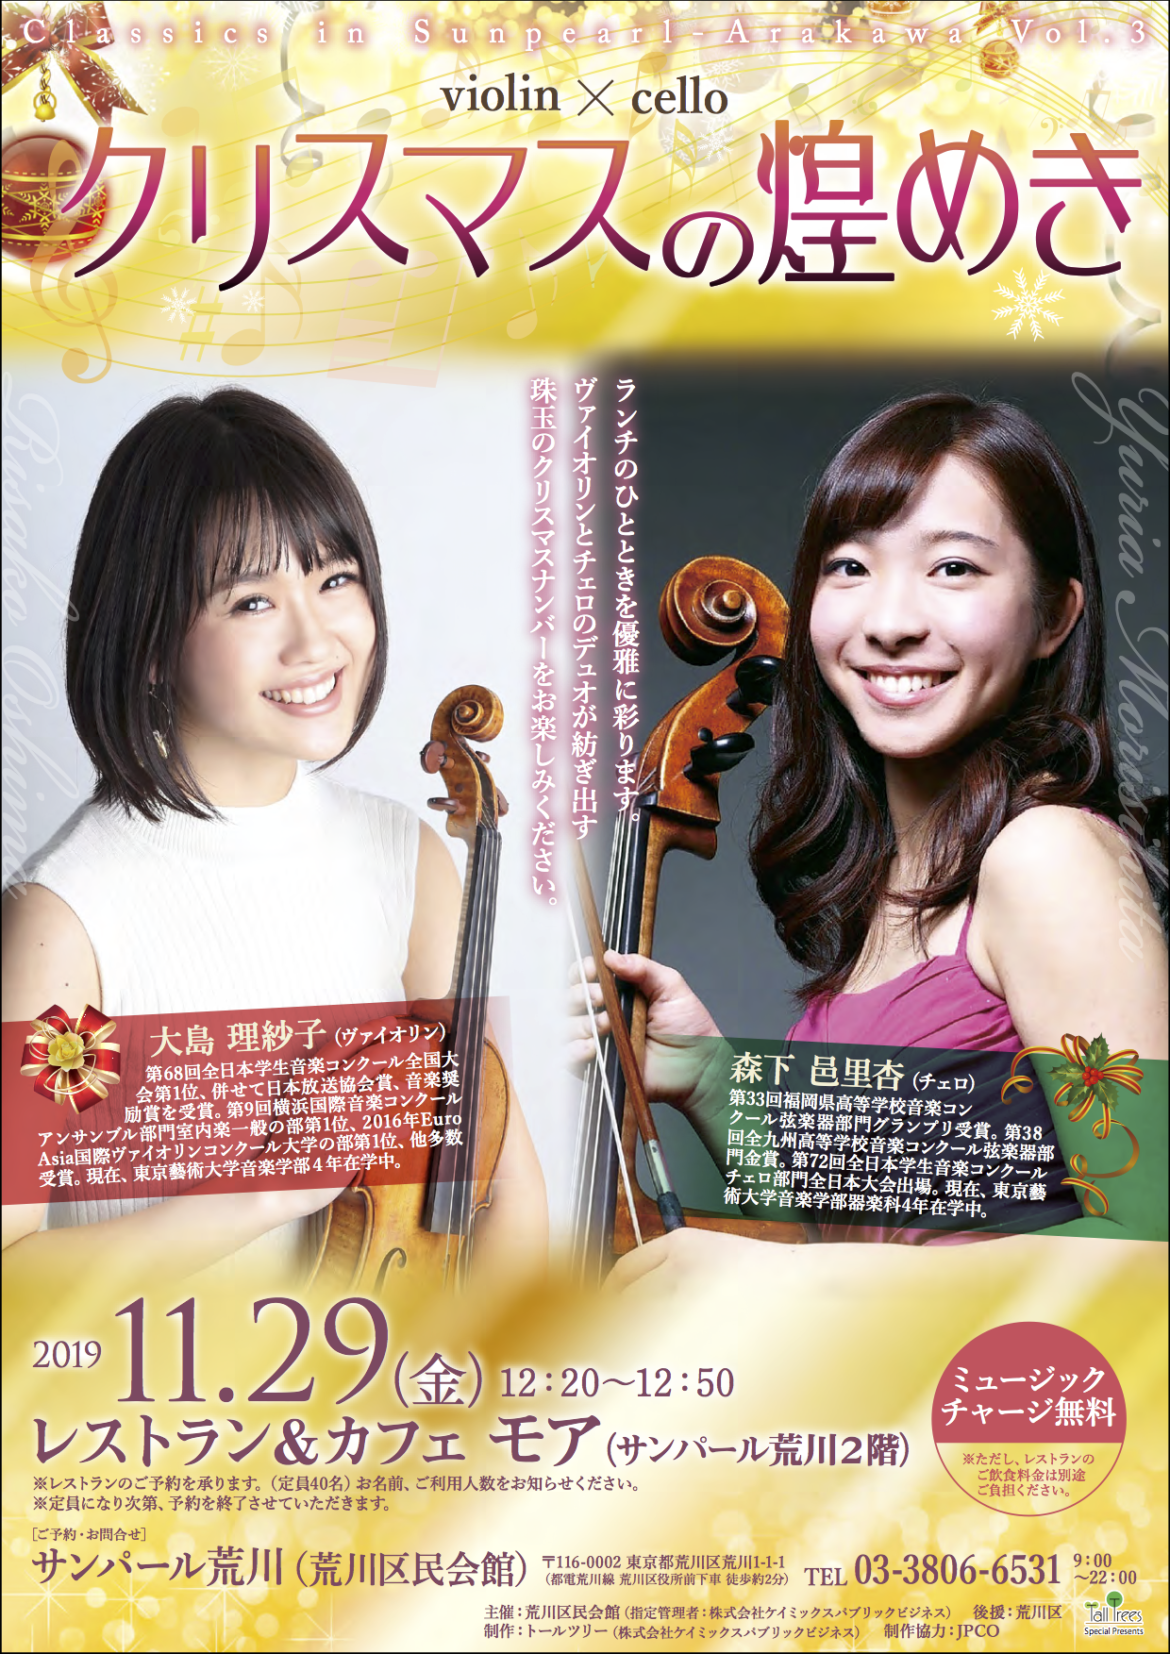 2019.11.29 Classics in Sunpearl-Arakawa vol.3 『クリスマスの煌めき』